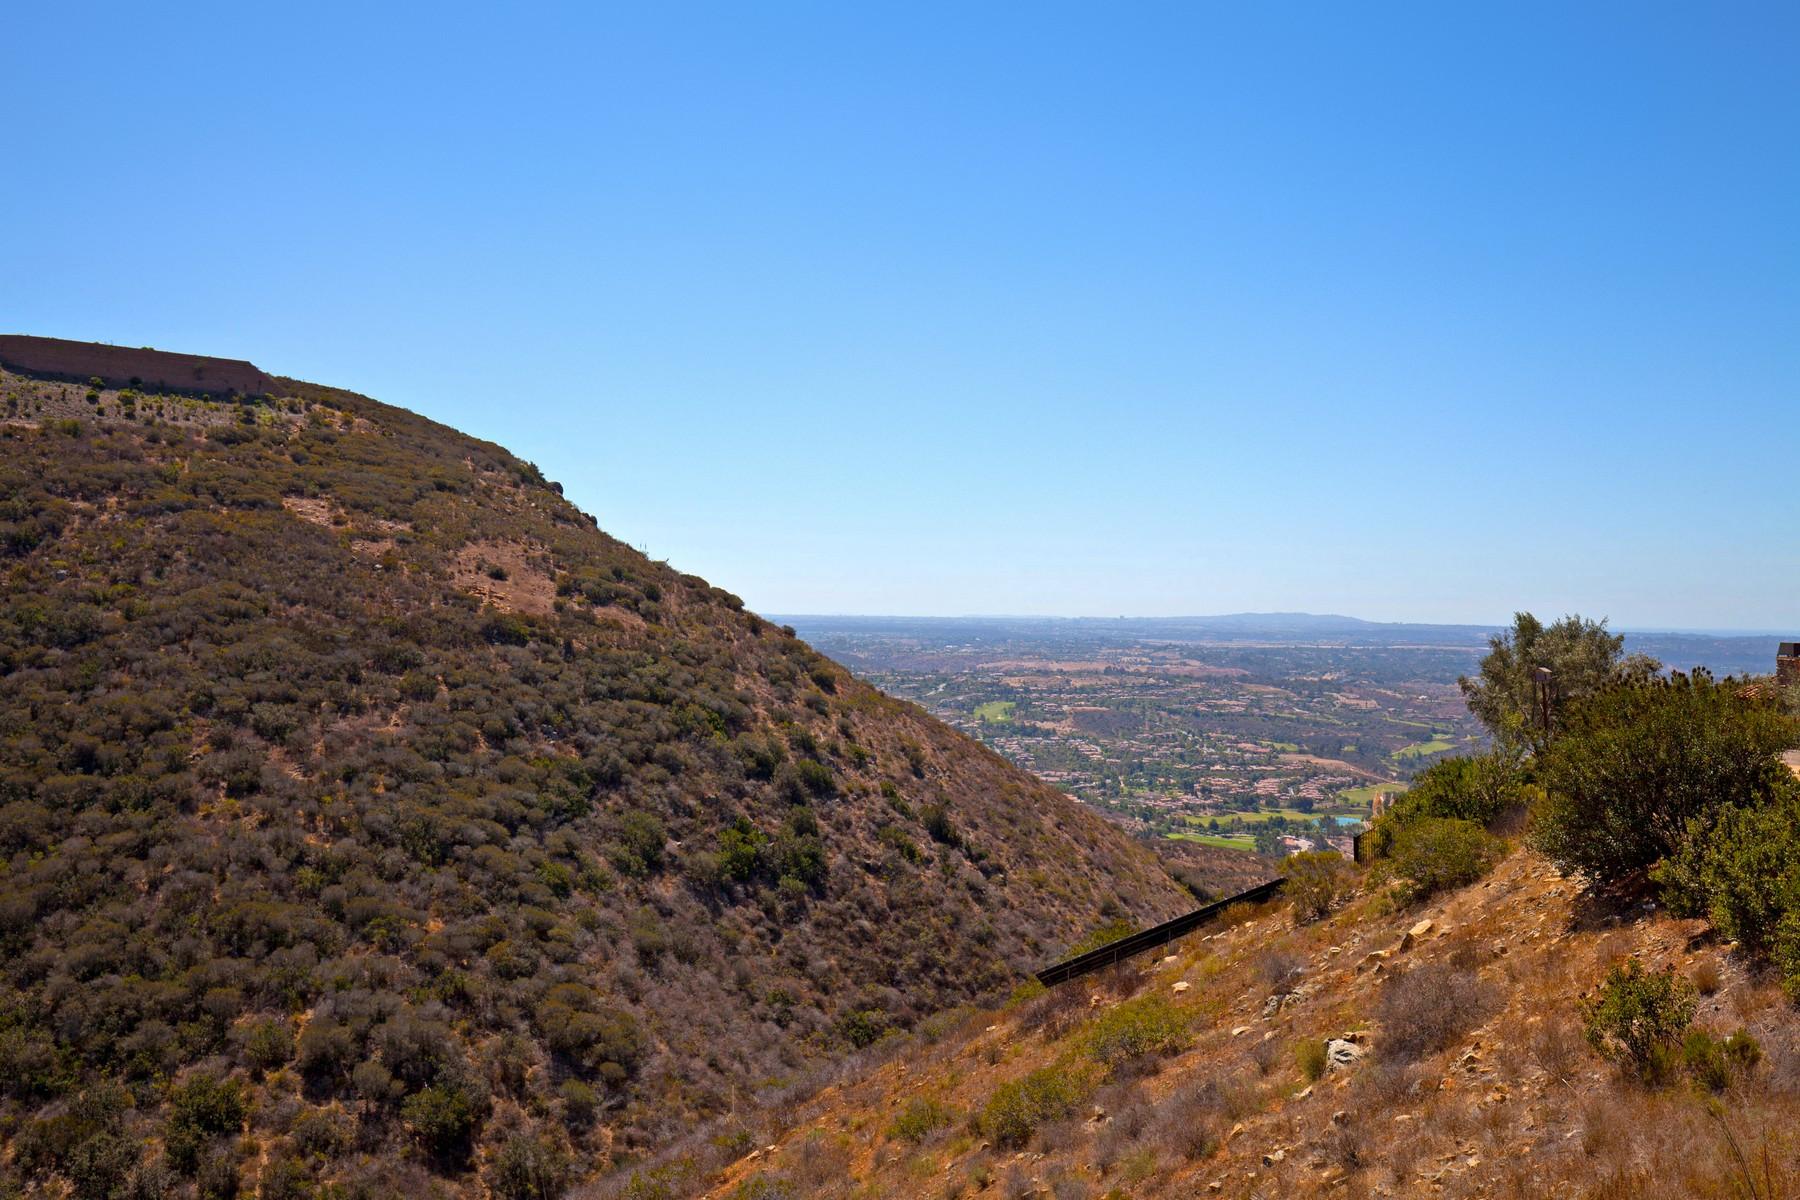 Additional photo for property listing at El Brazo lot 87  Rancho Santa Fe, California 92067 Estados Unidos